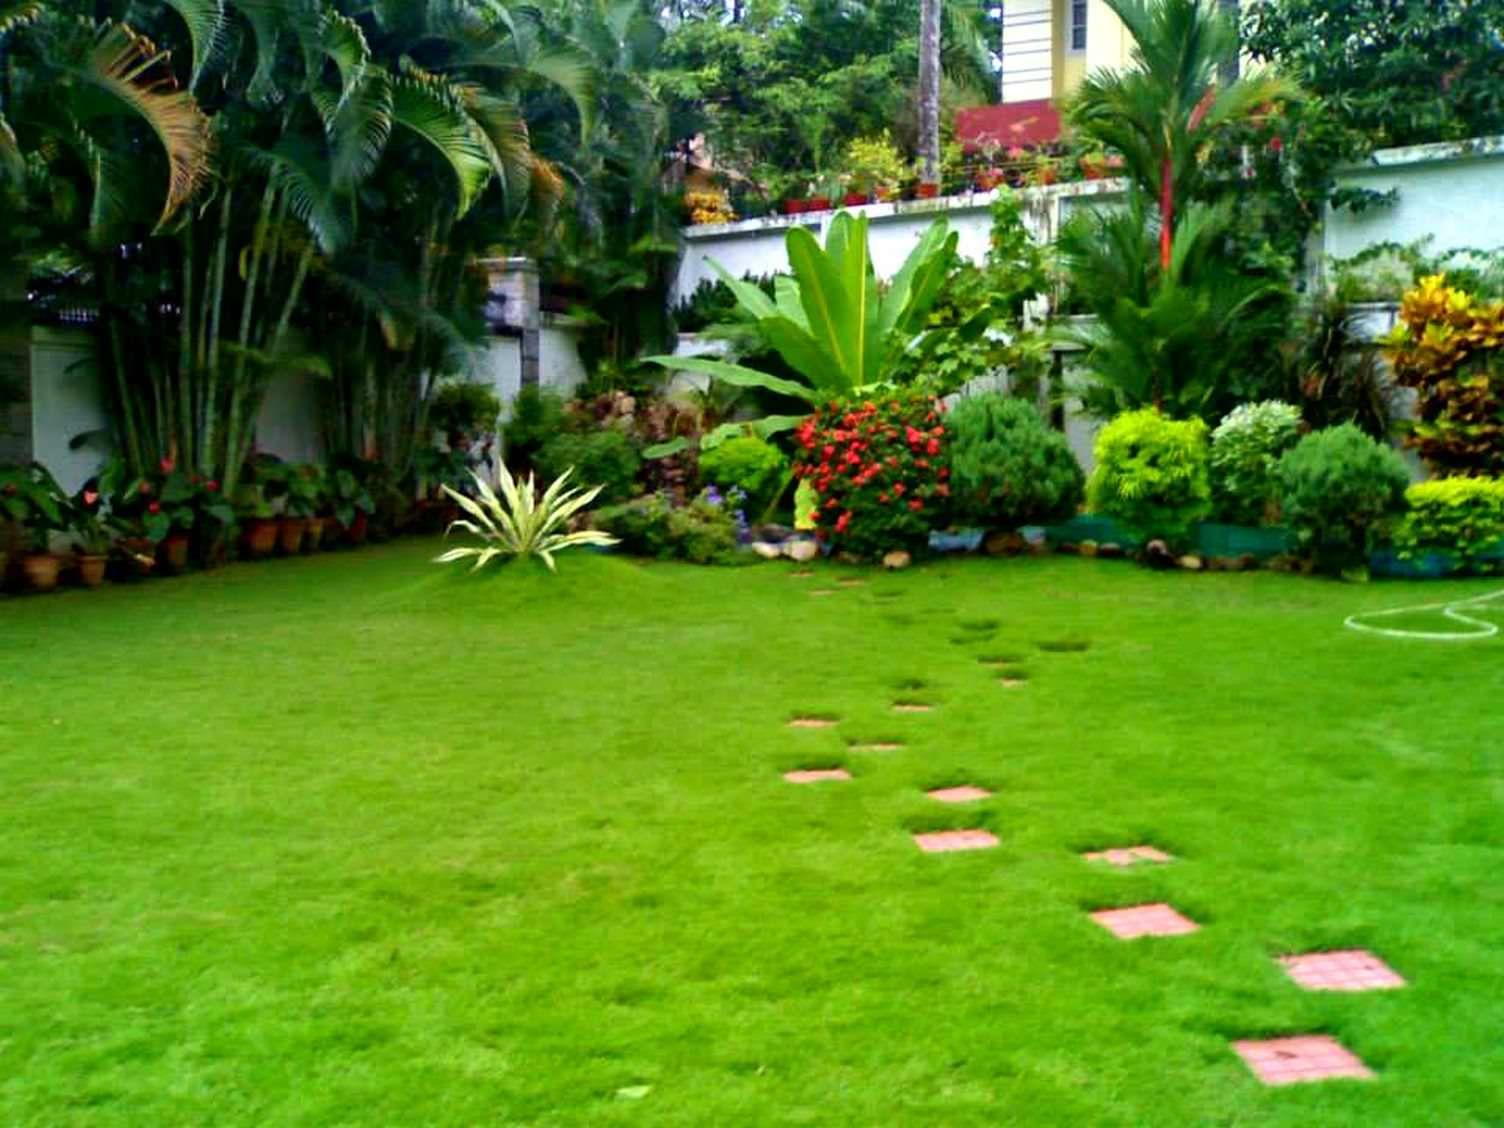 Home Garden Landscaping In Kerala Landscape Design Garden Projects Garden